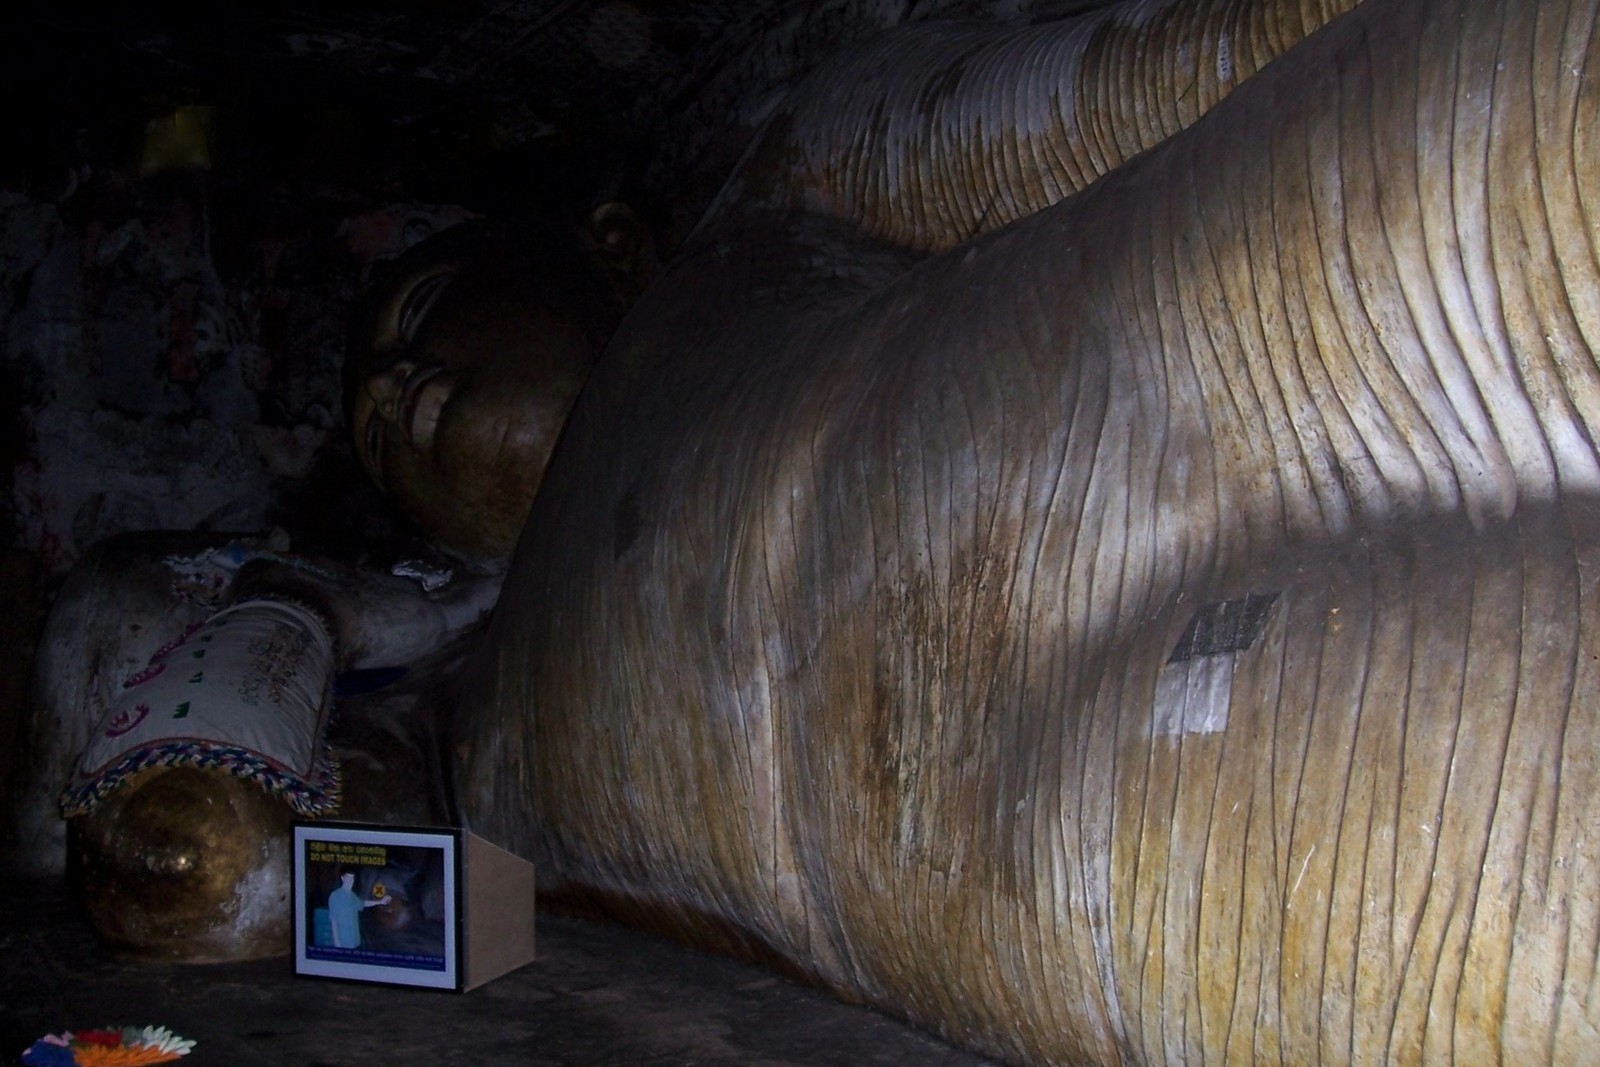 Höhlentempel von Dambulla - 1. Höhle